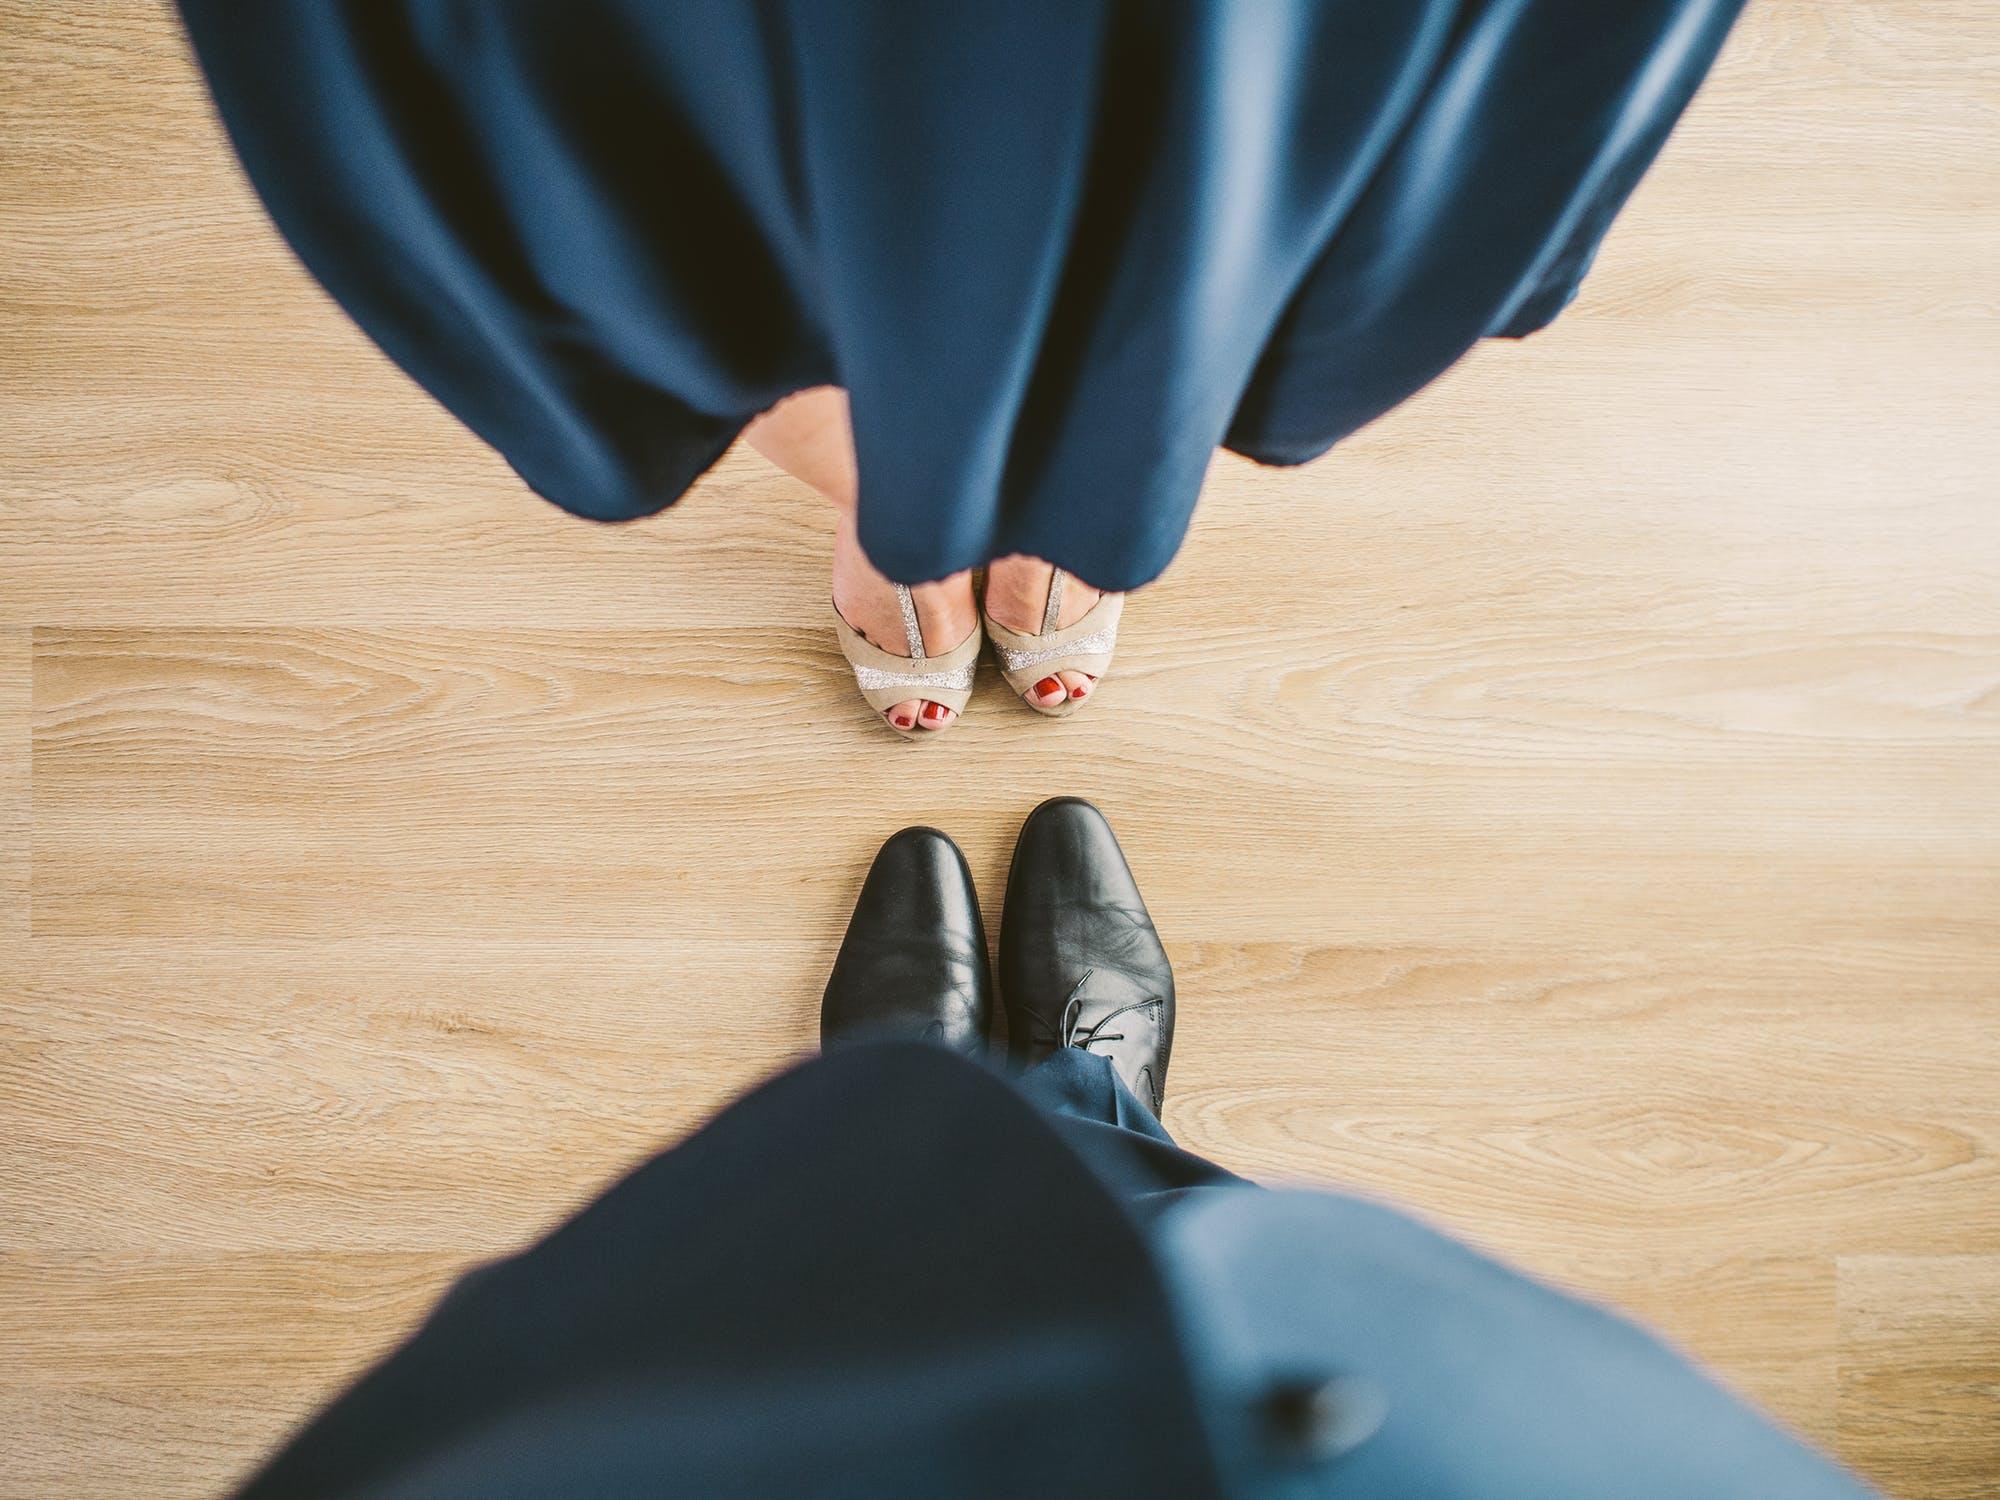 Hambatan-hambatan Menuju Pernikahan, Apa Saja?